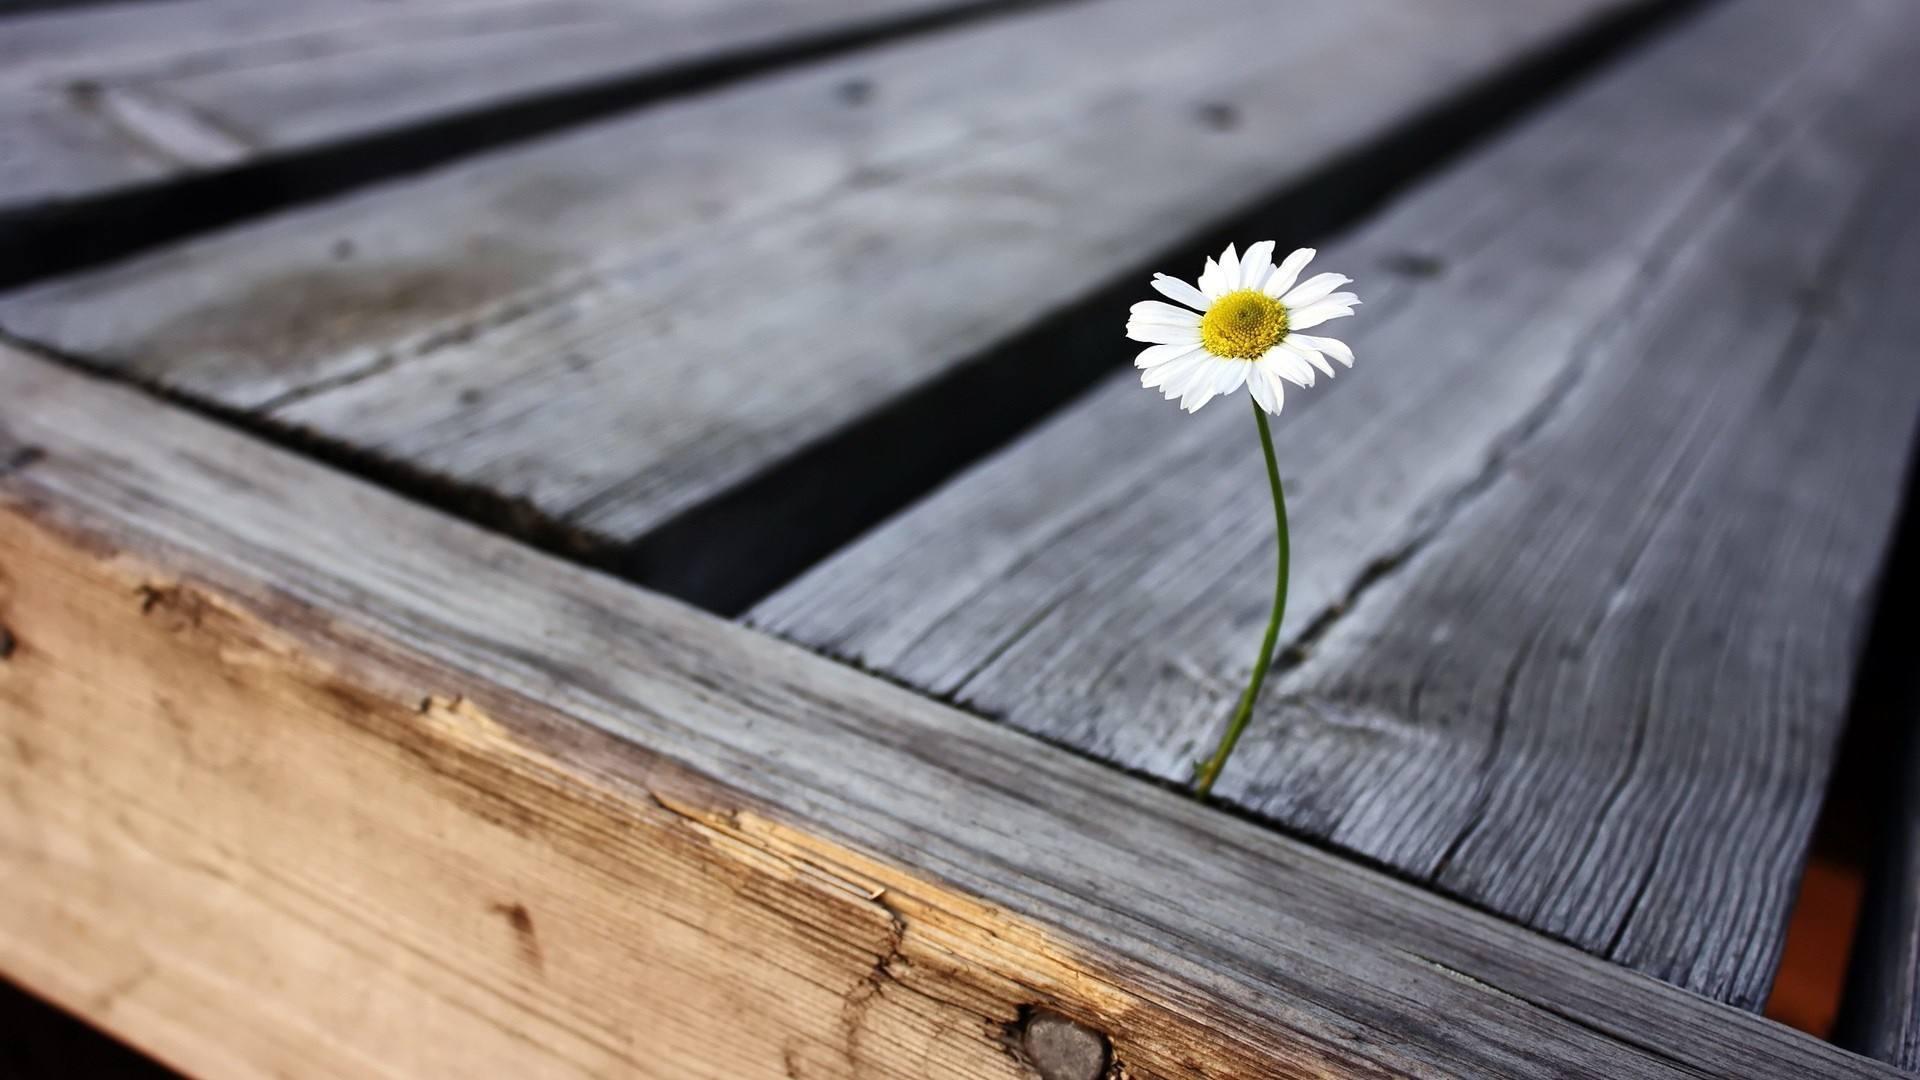 A single daisy growing through a wooden walkway